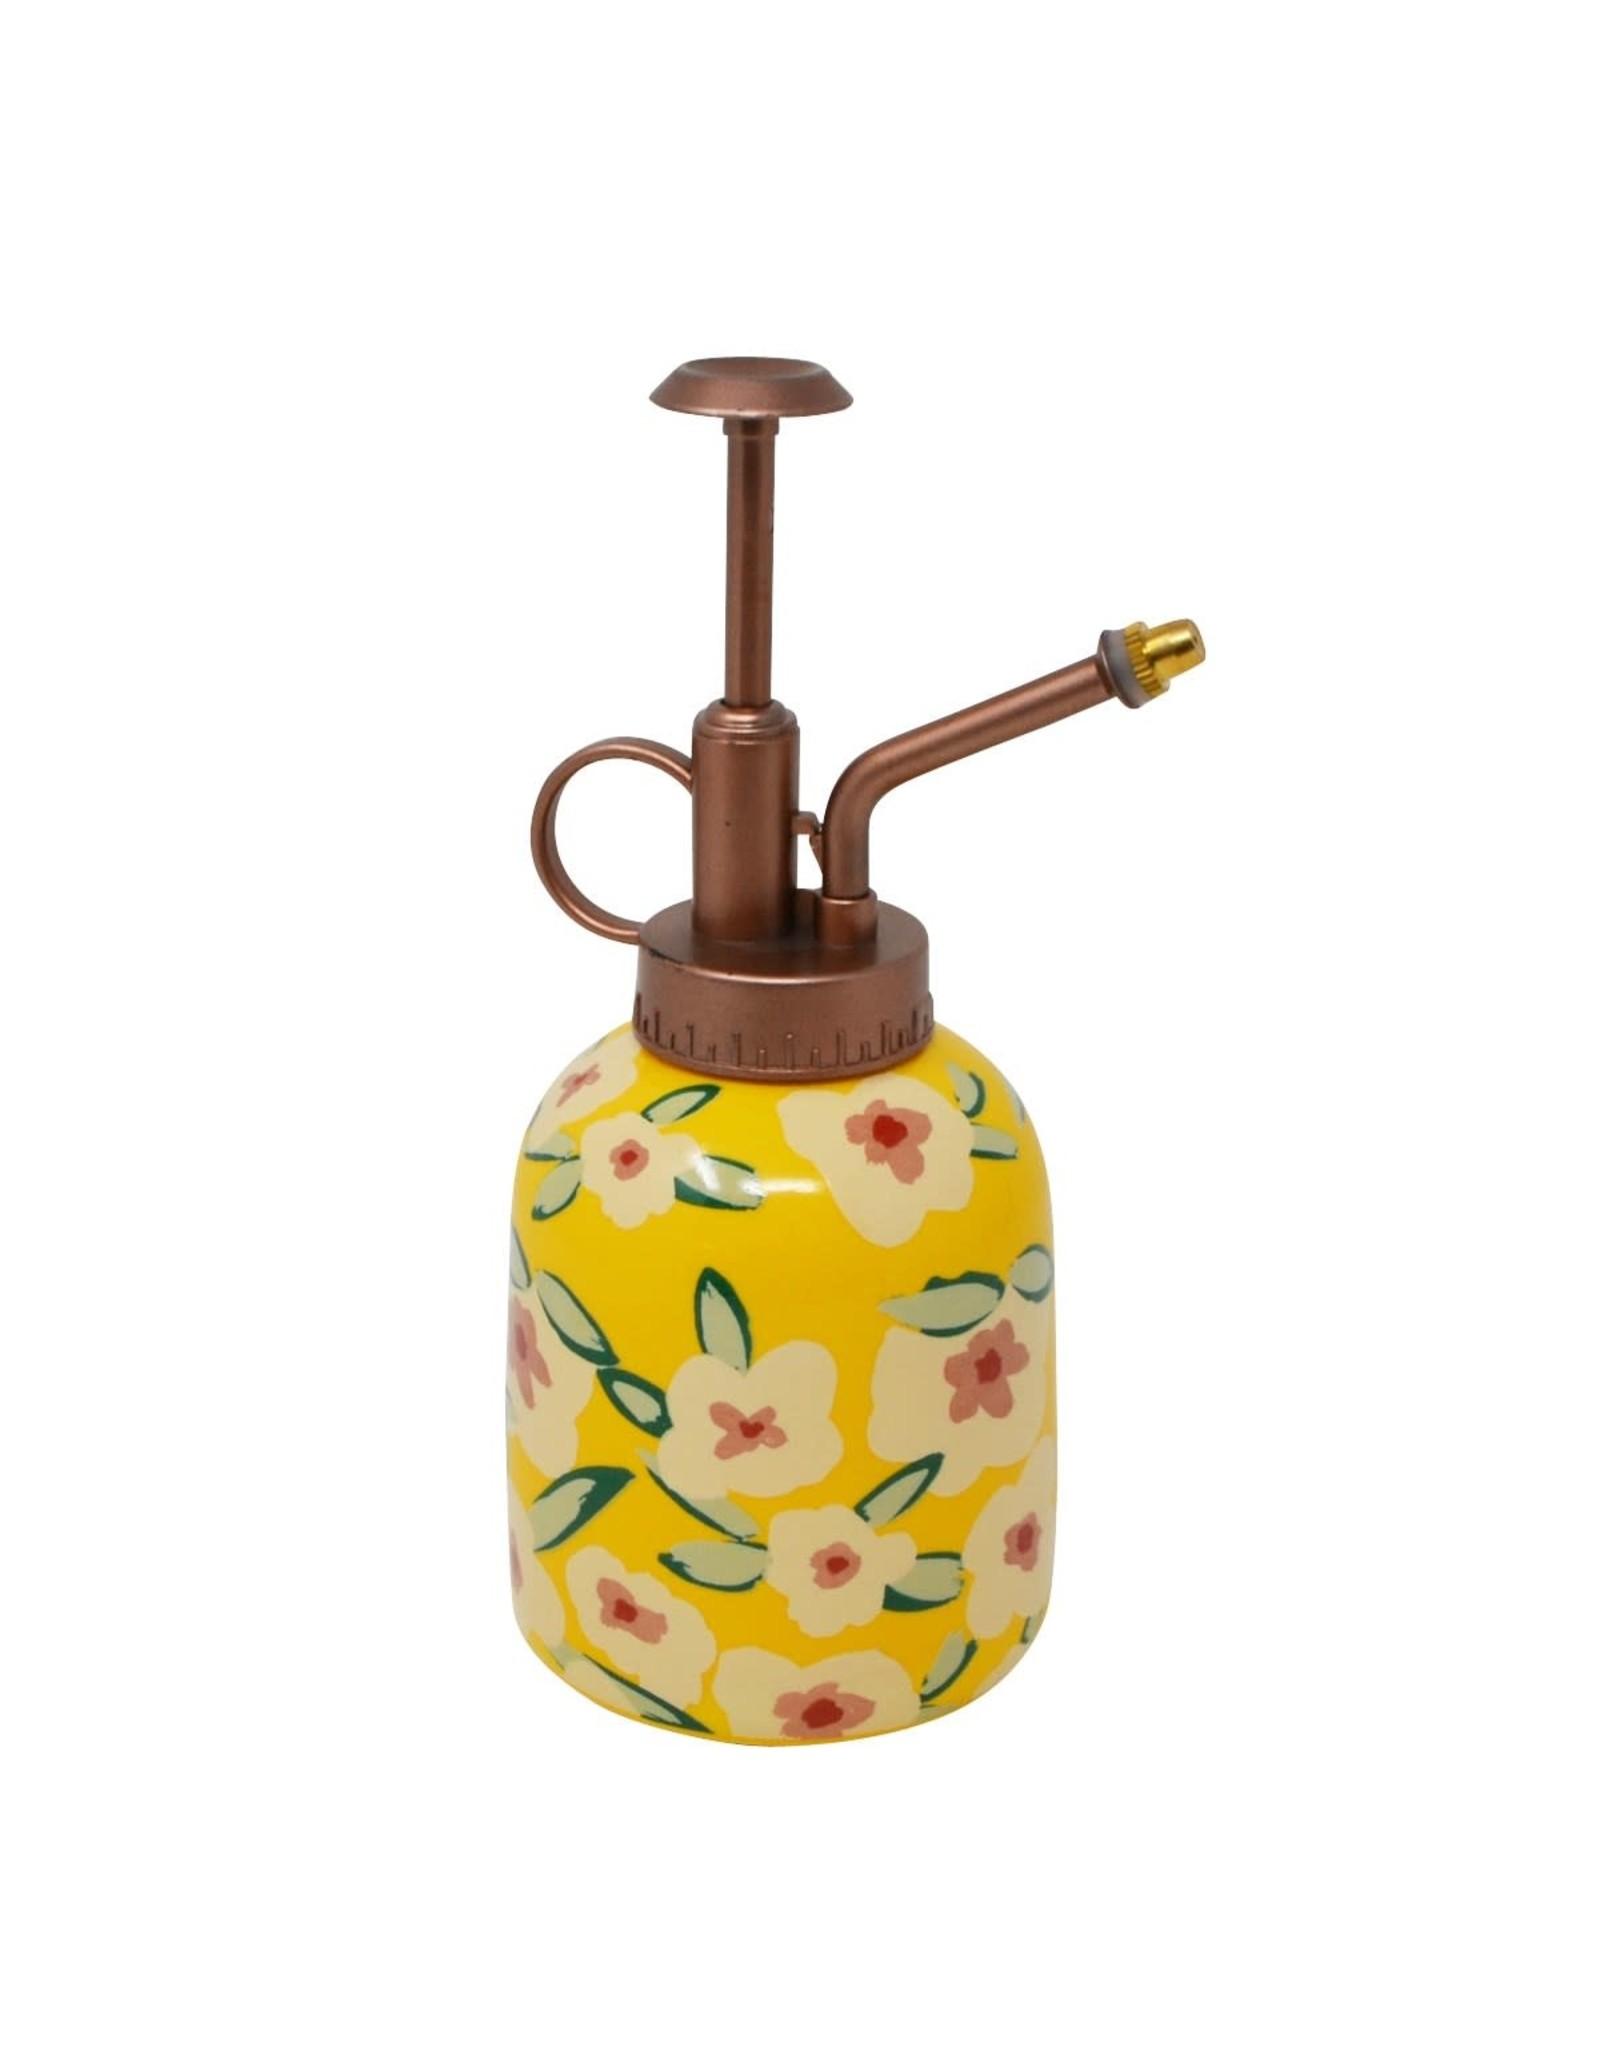 Brumisateur pour plantes - Fleuri jaune